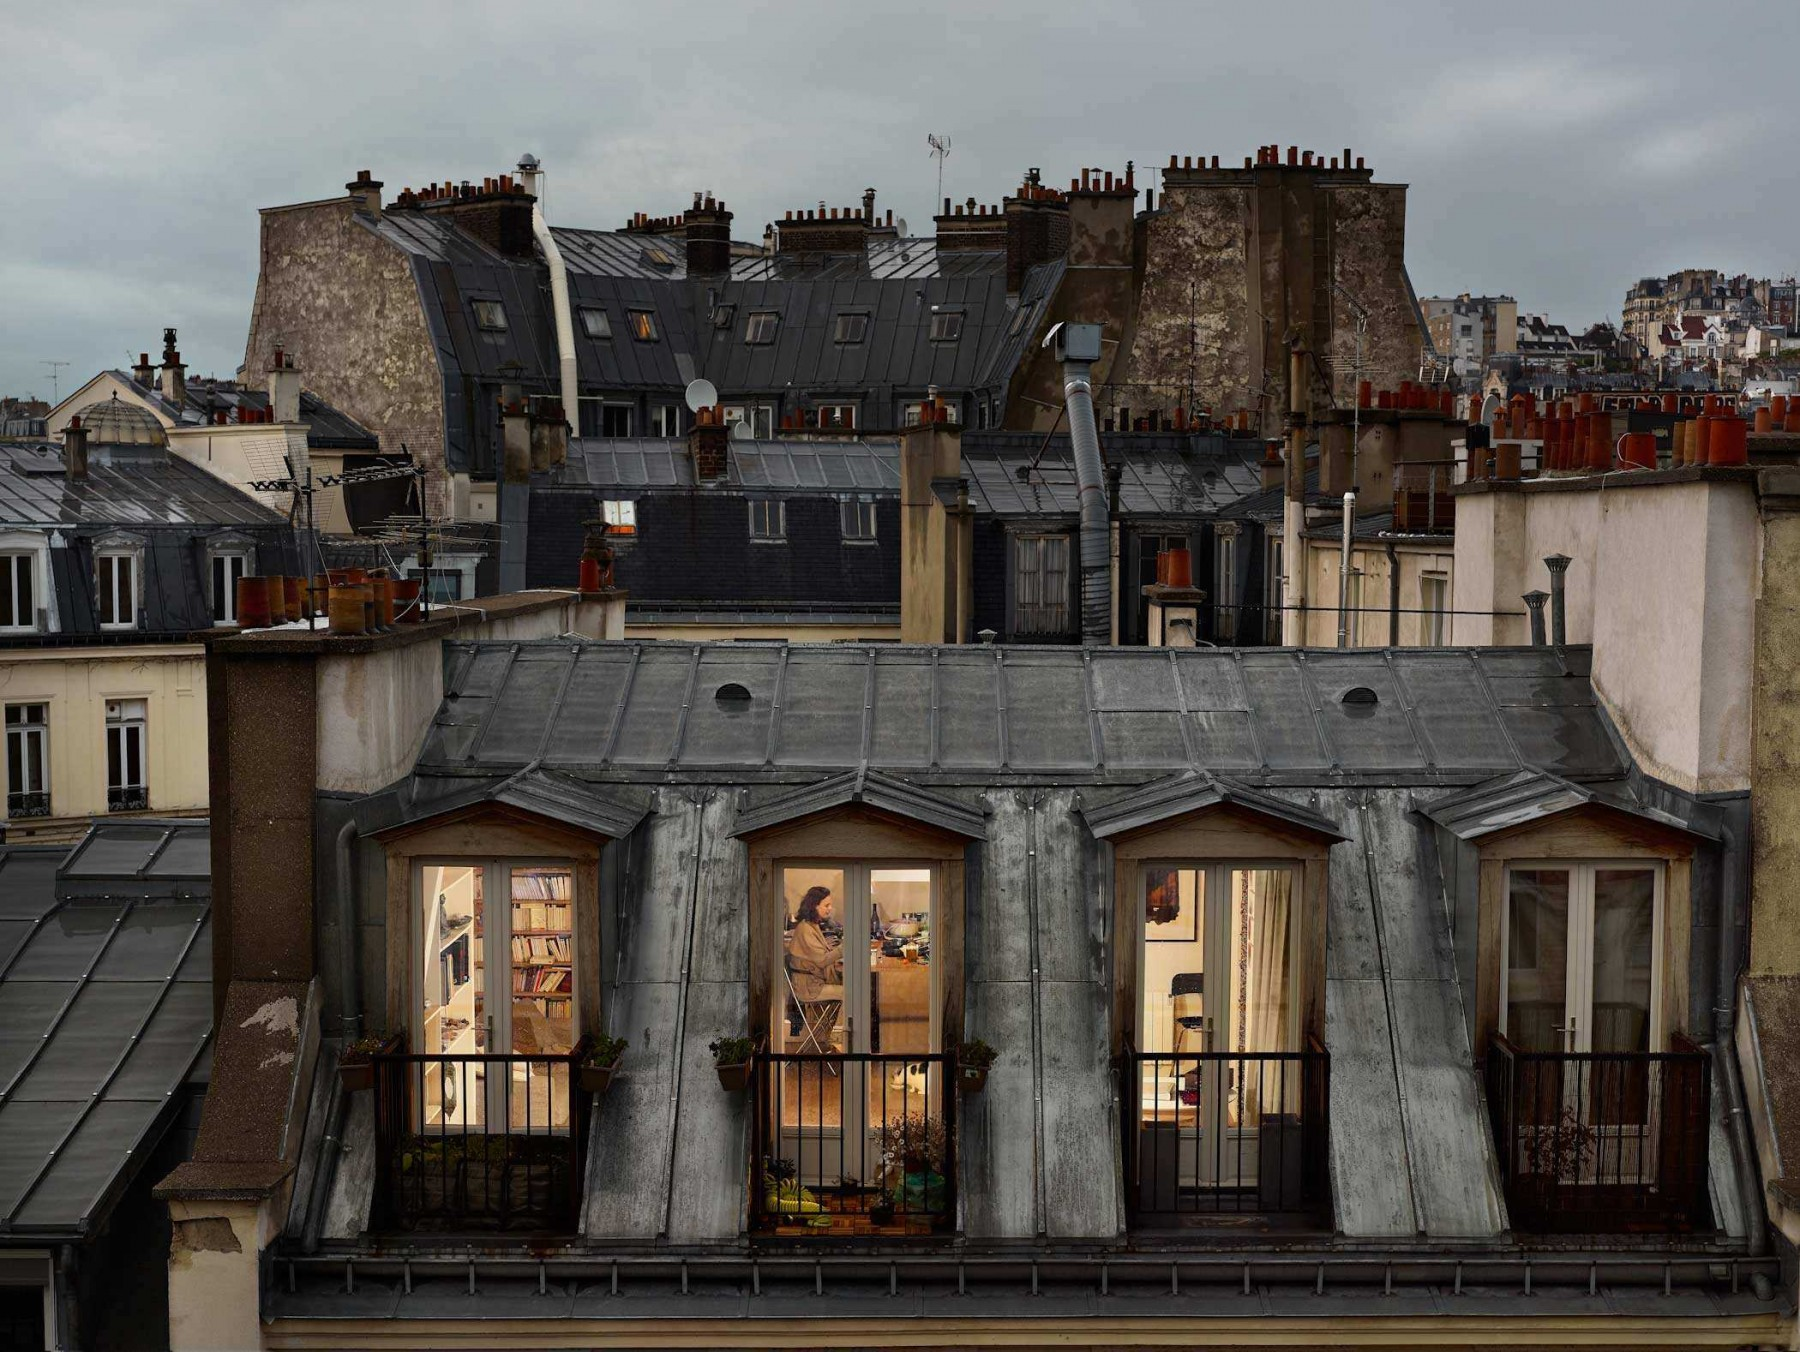 Out My Windows by Gail Albert Halaban